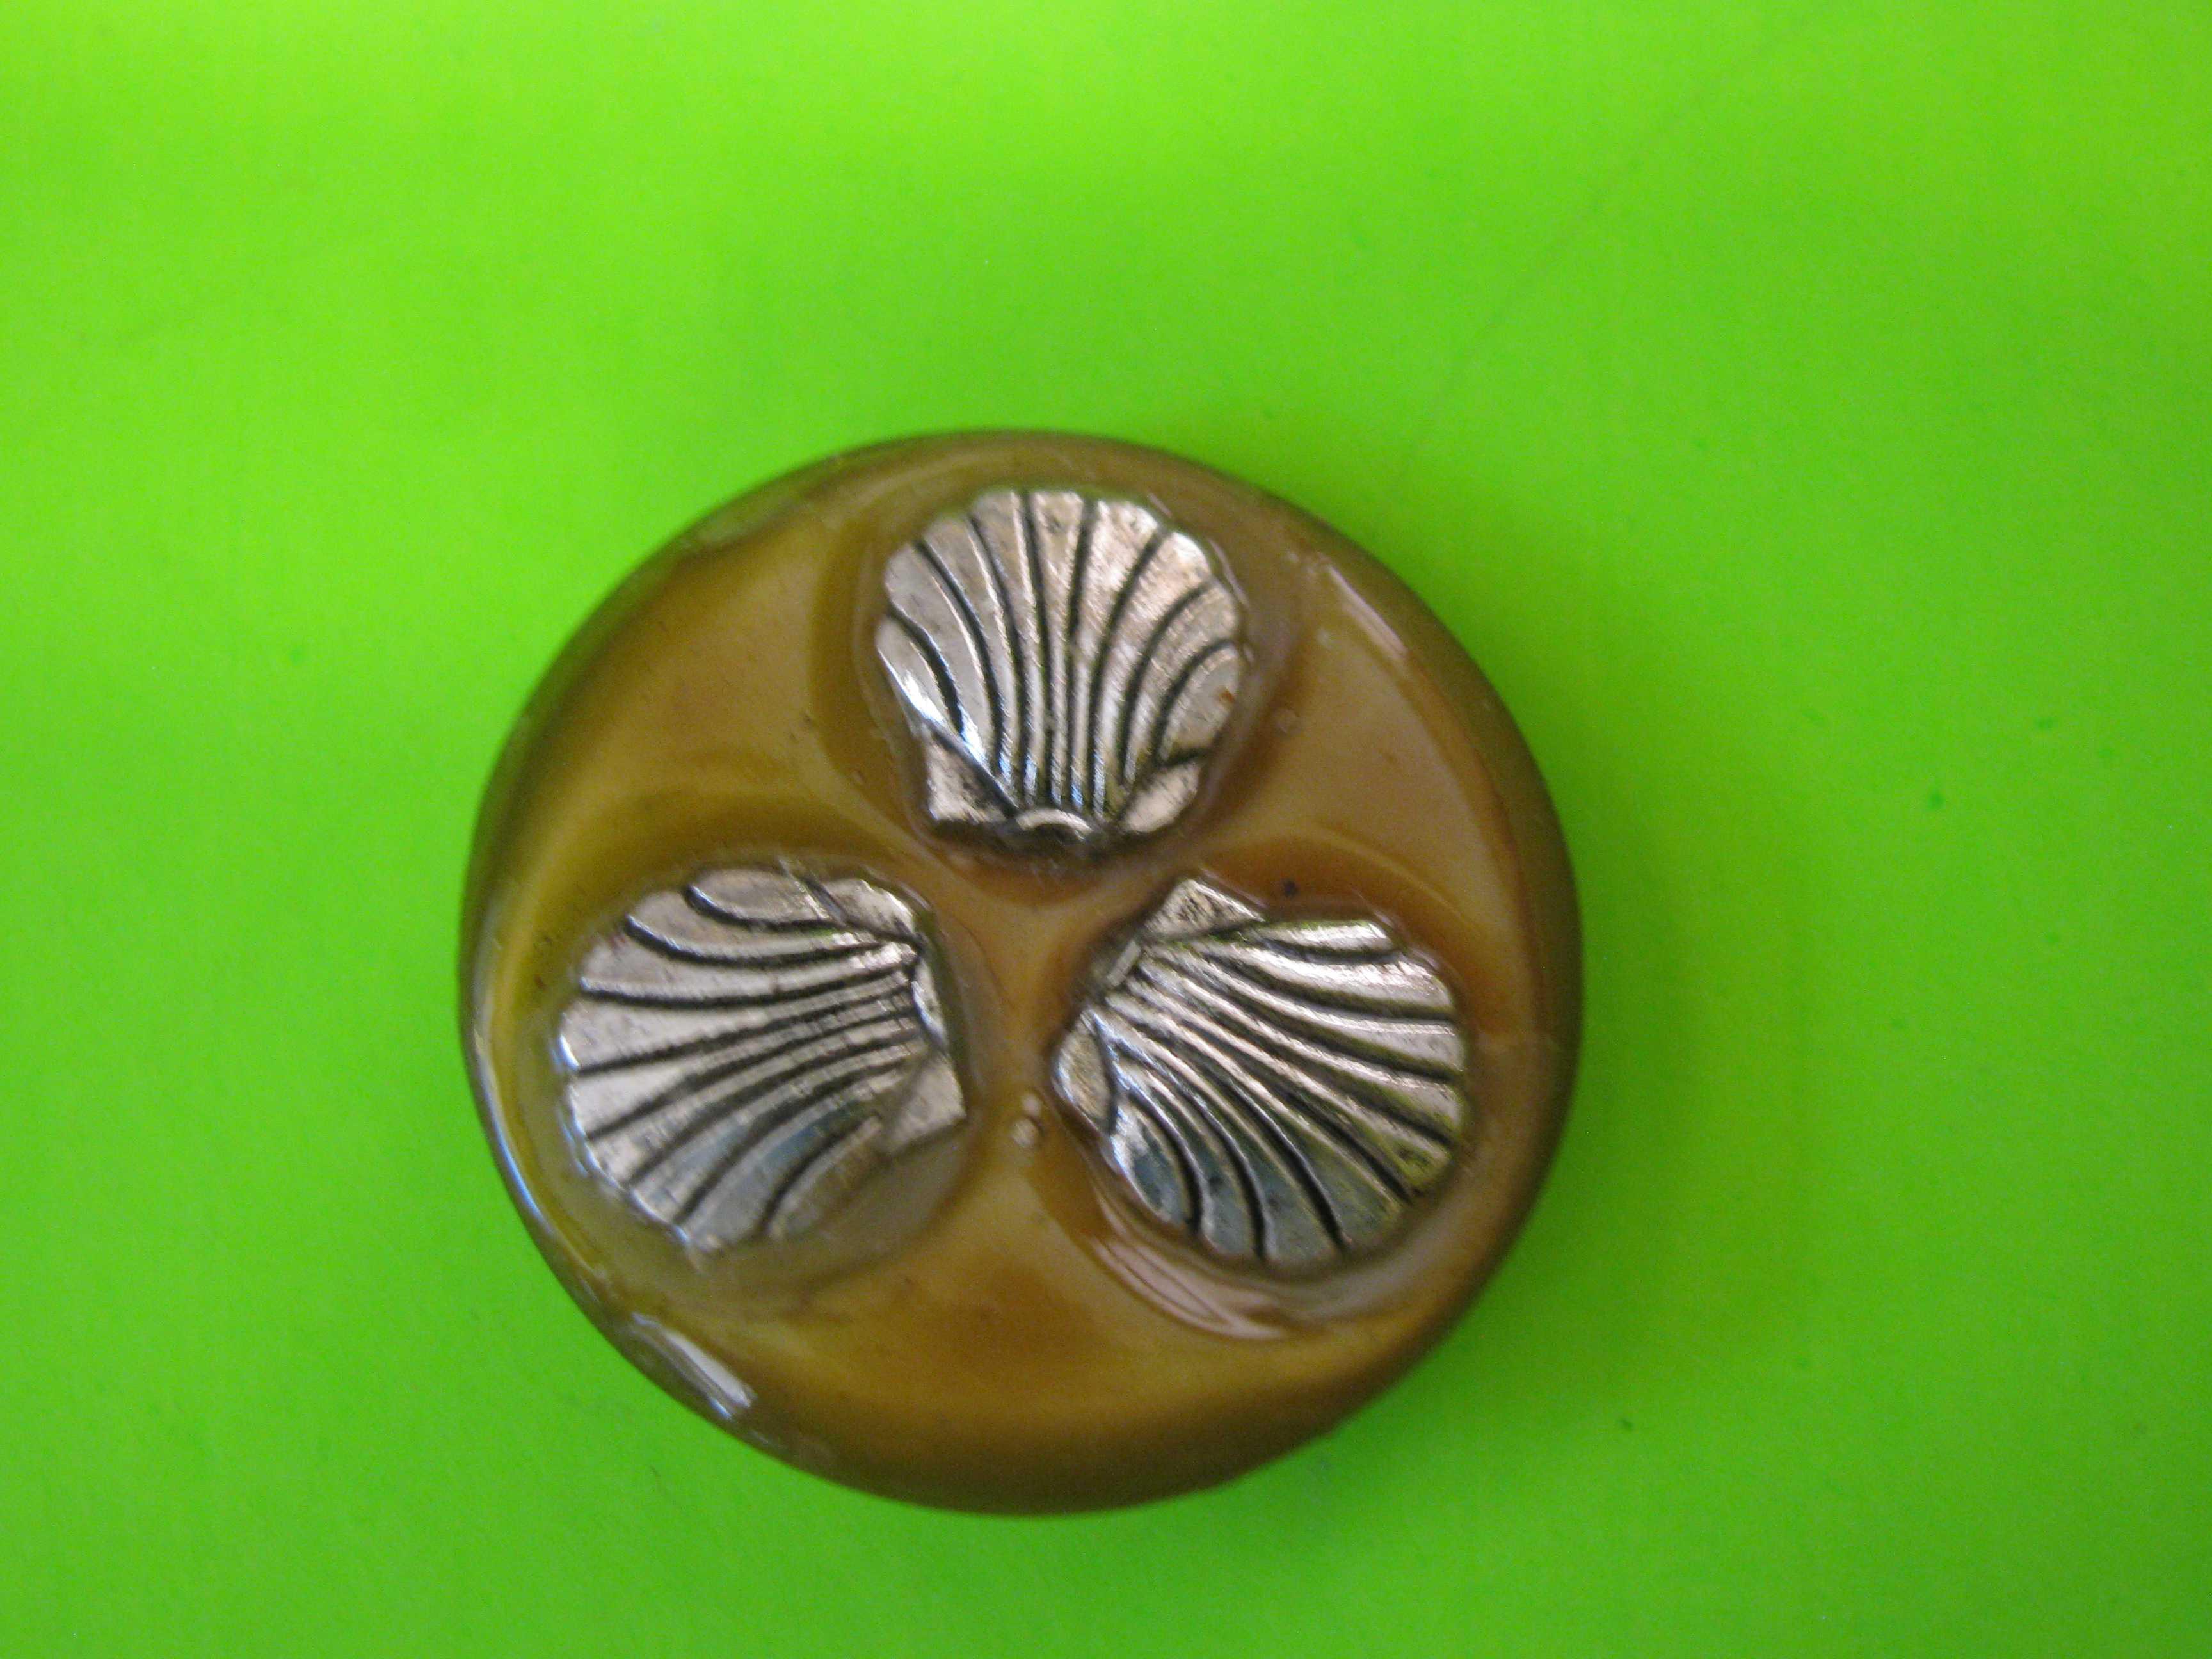 Three Silver Sea Shells on Circular Plastic Button with Claw Shank